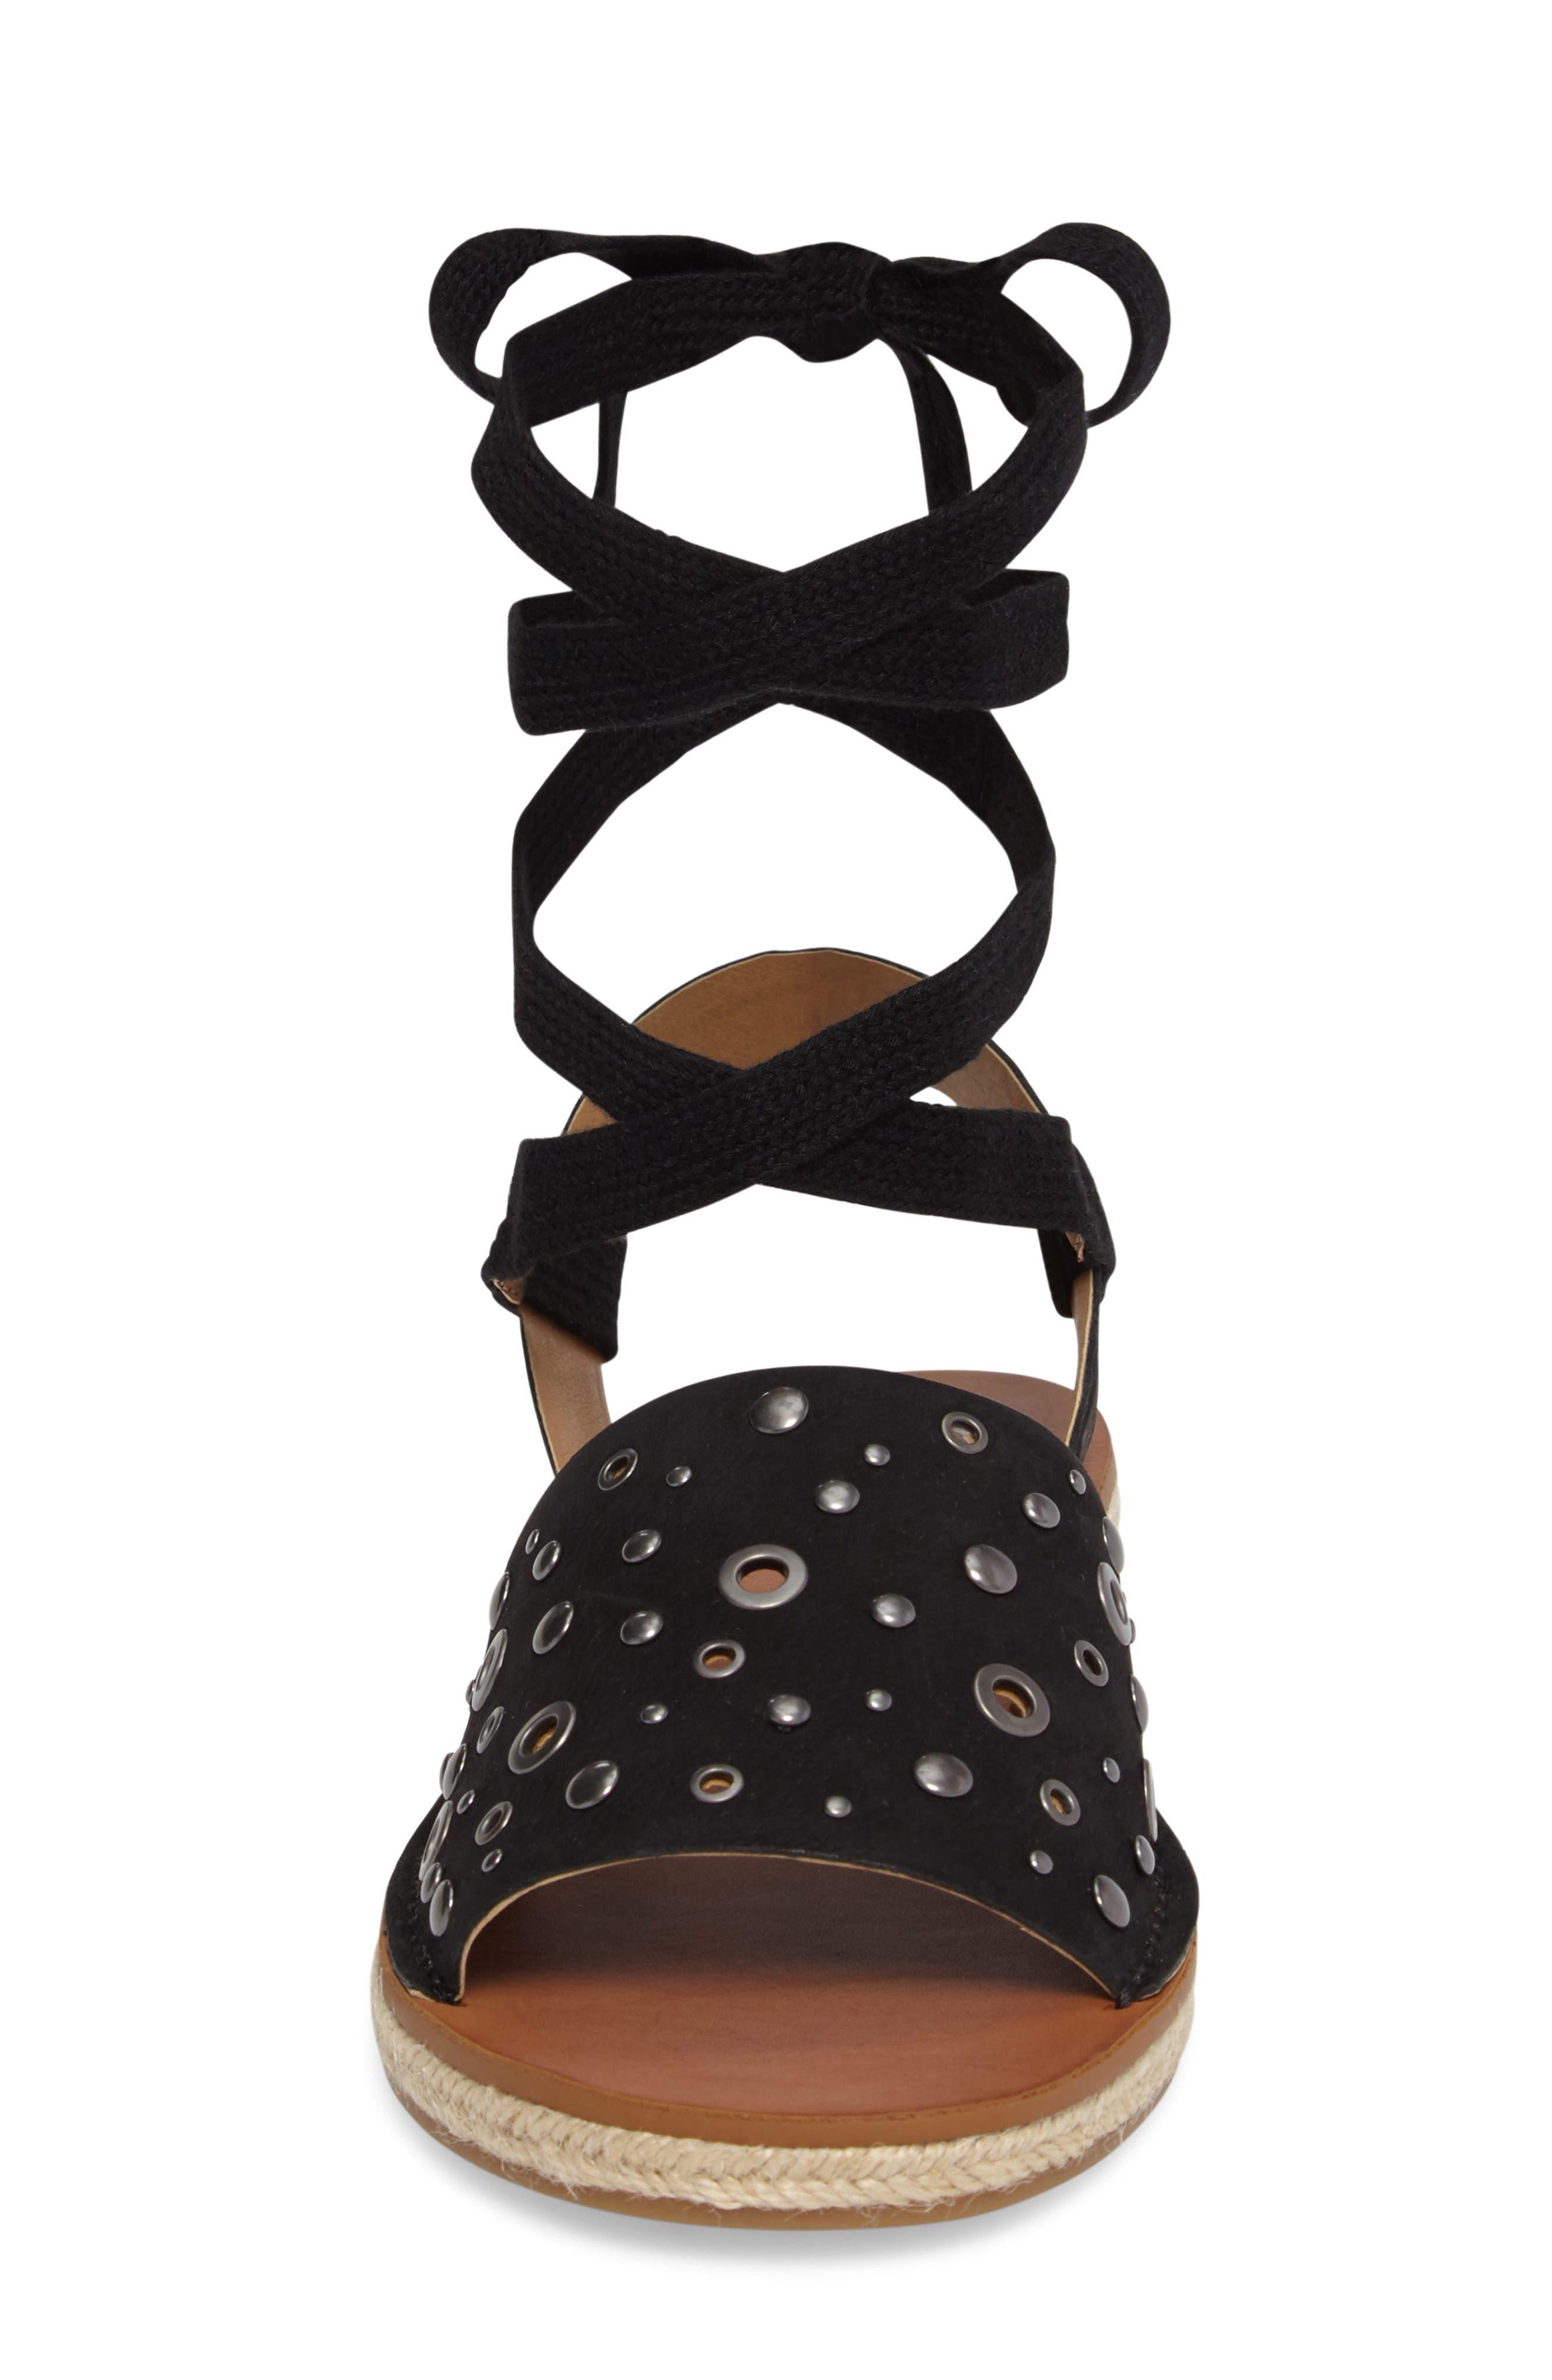 Daytah Ankle Tie Sandal,                             Alternate thumbnail 13, color,